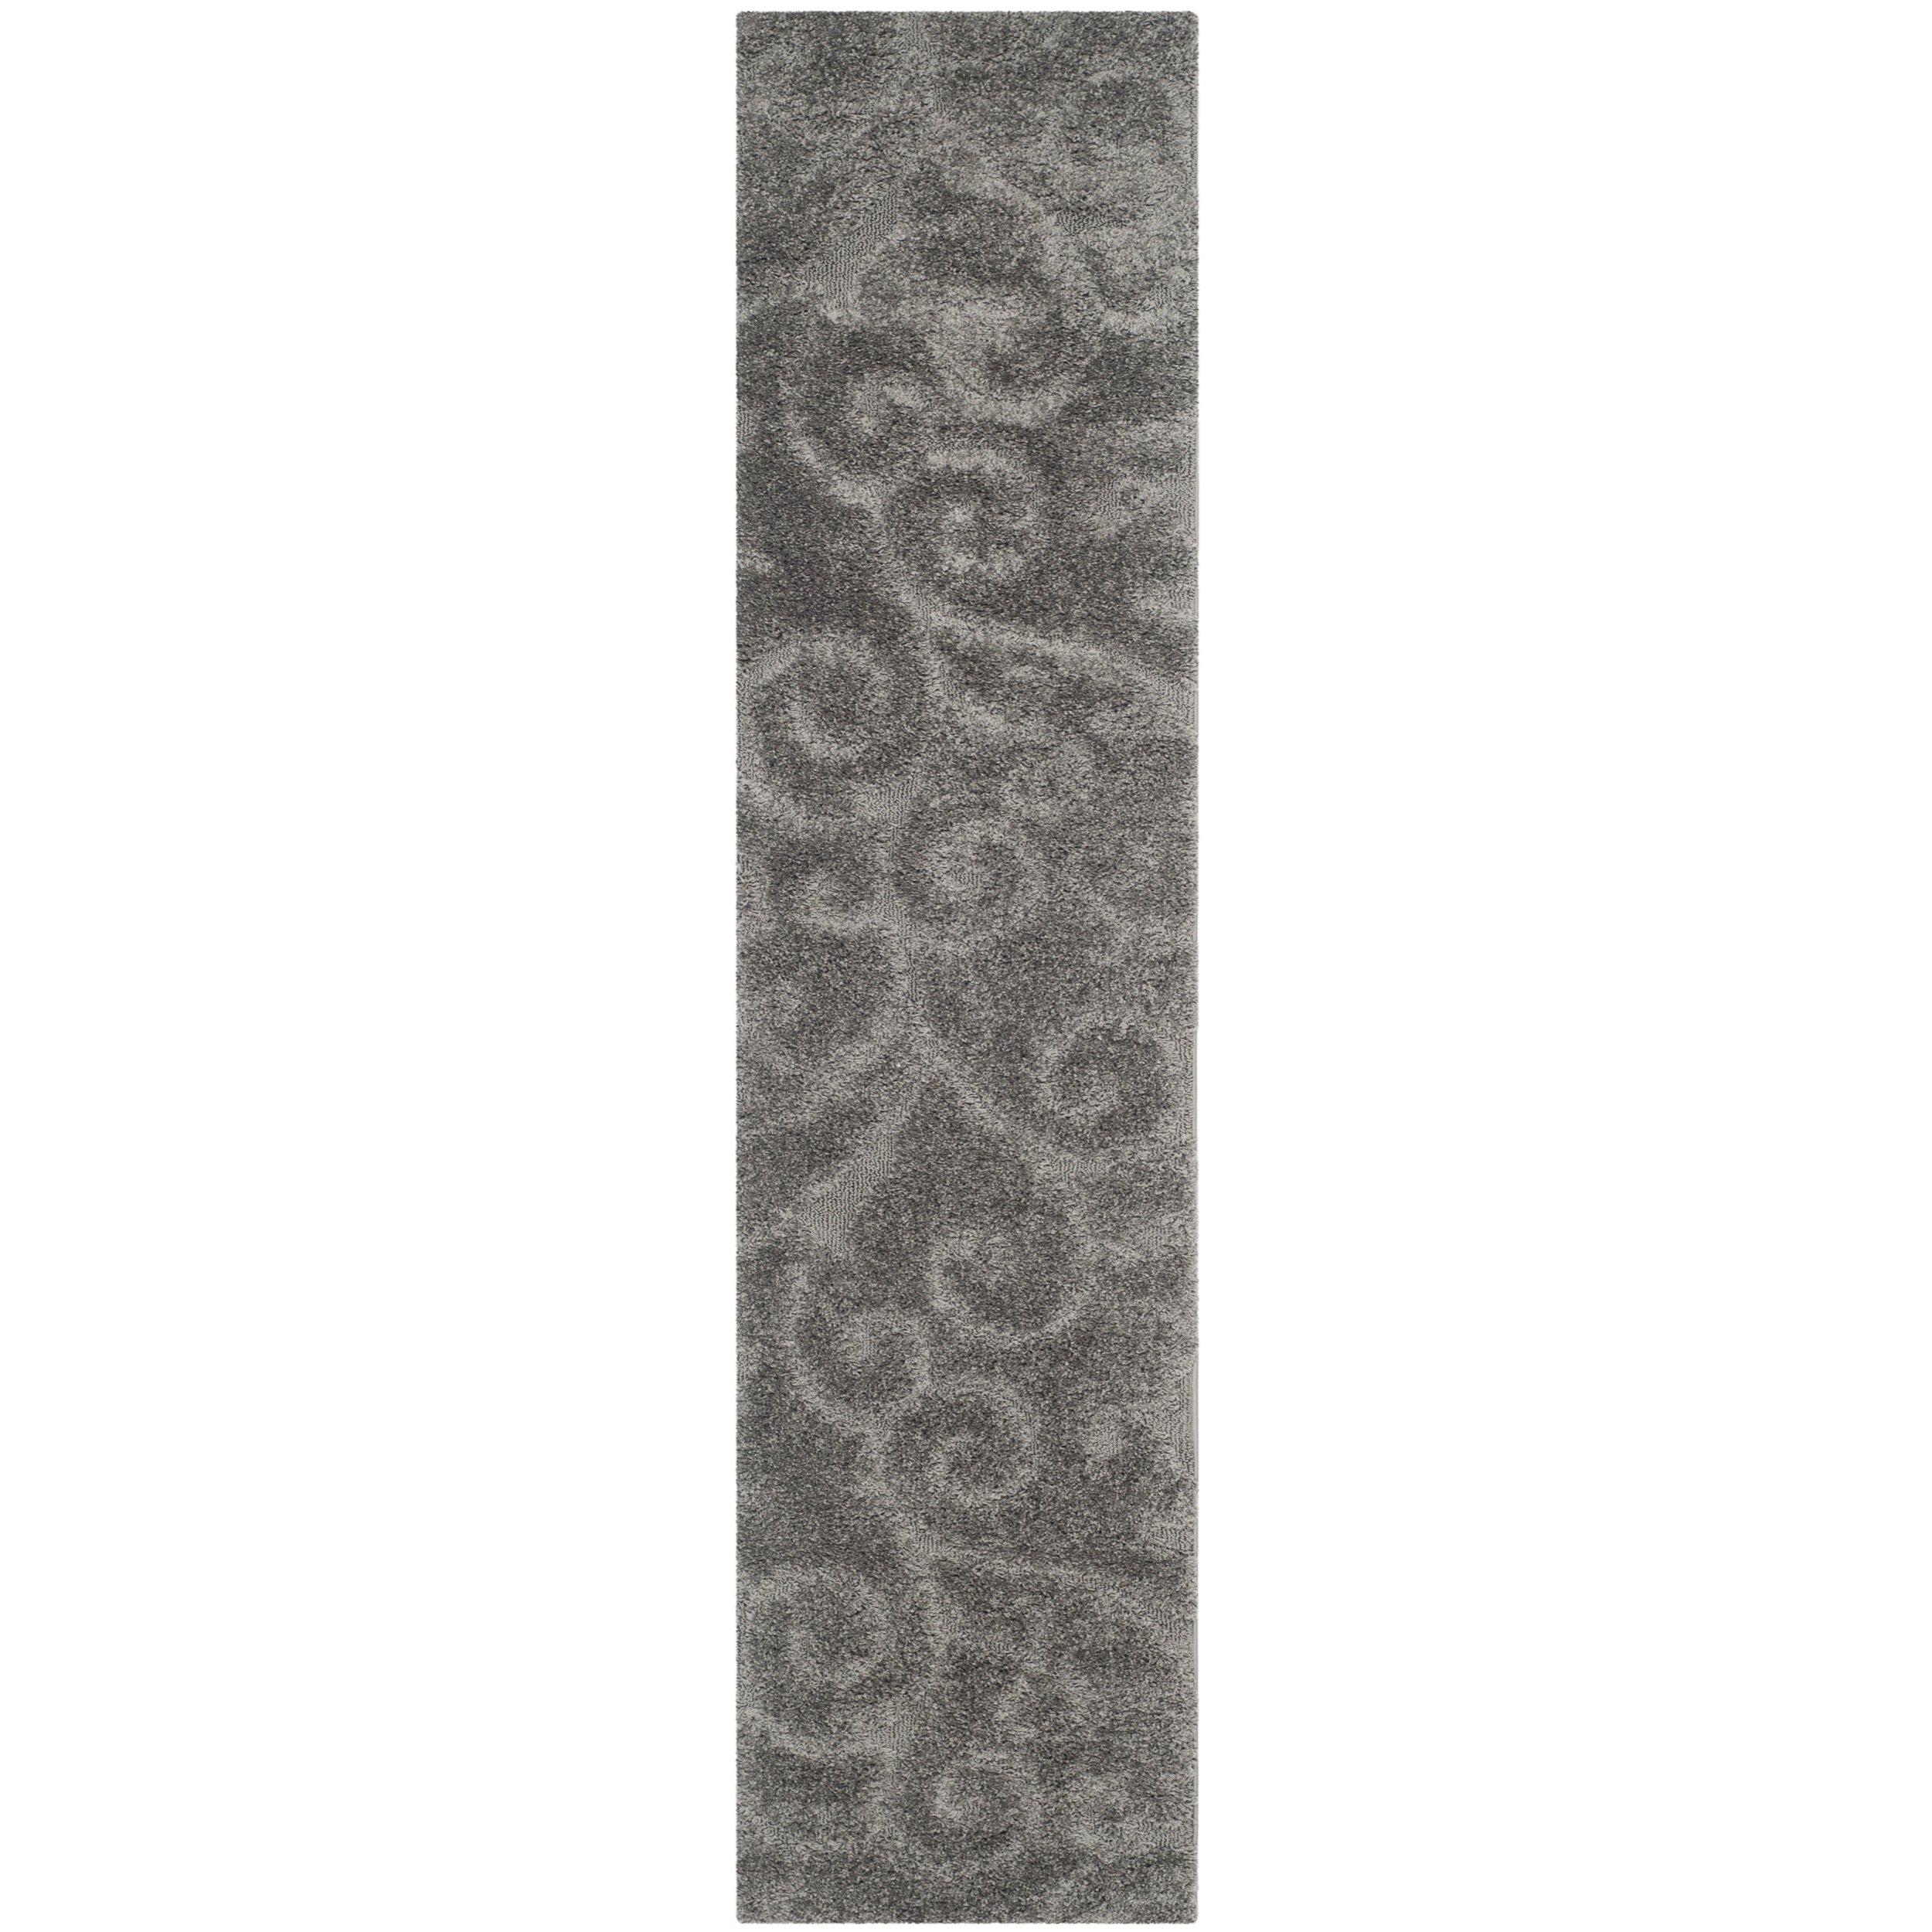 Rowes Furniture Charlton Home Rowes Swirl Grey Area Rug & Reviews | Wayfair.ca